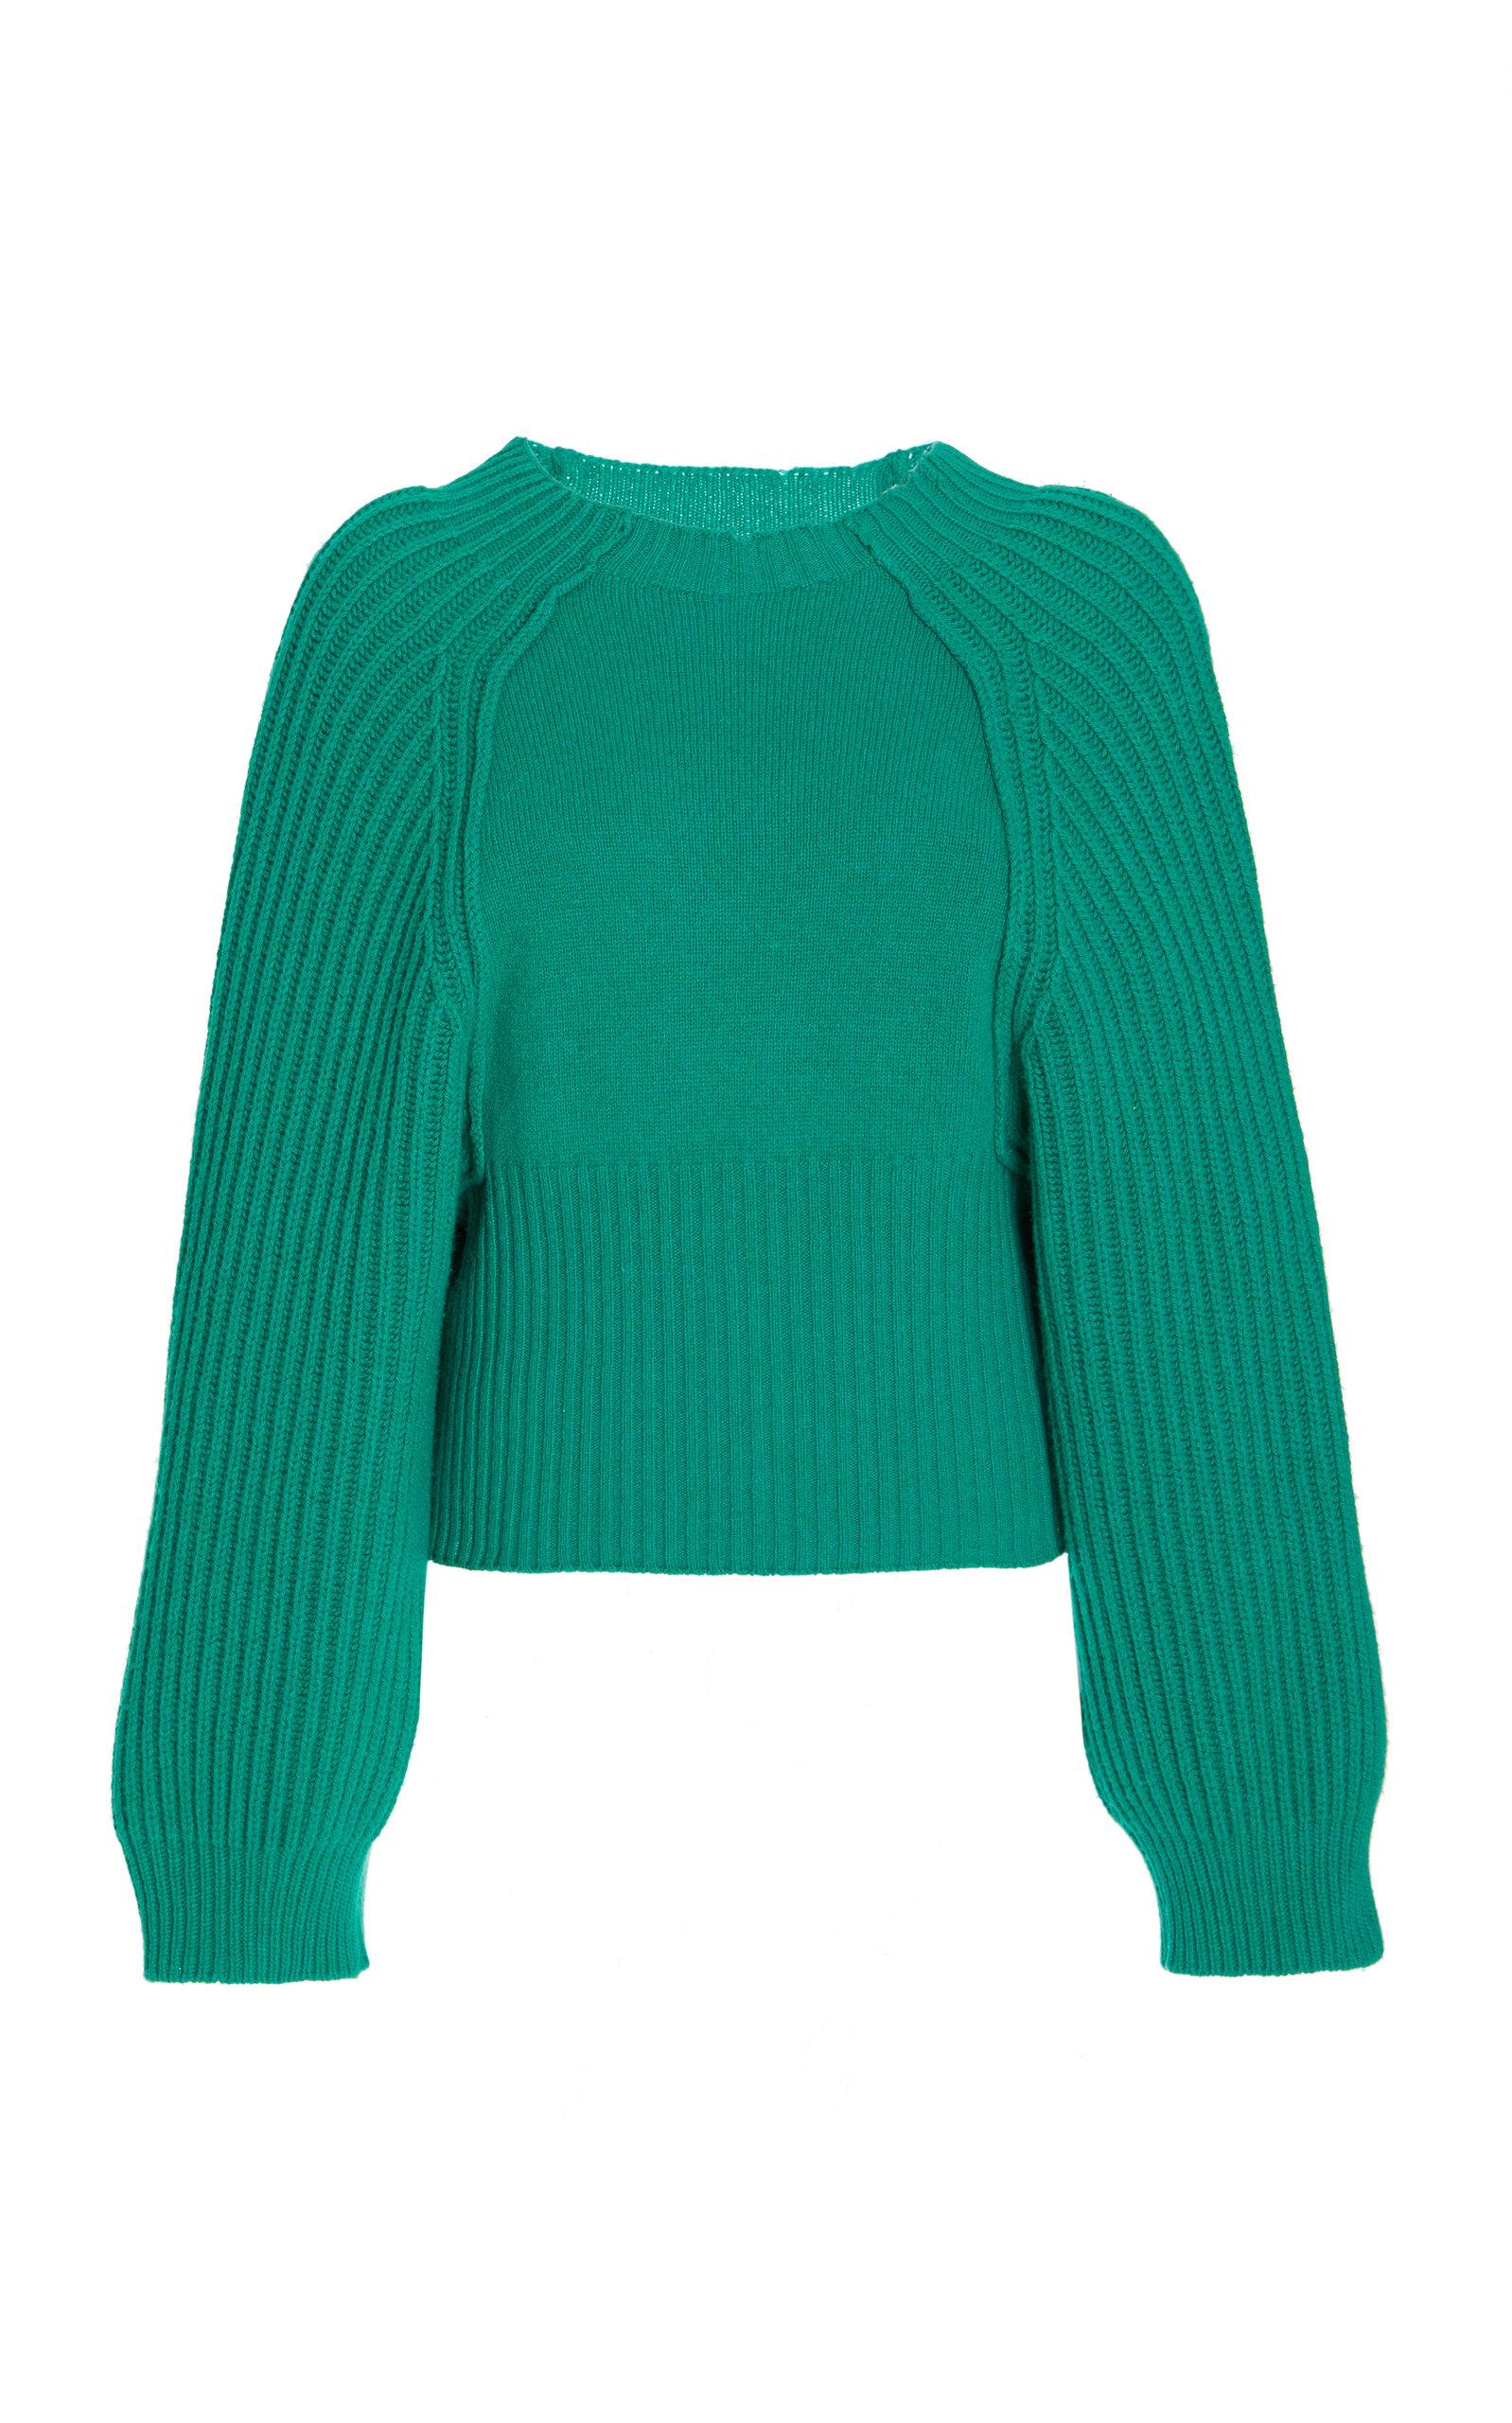 Stella McCartney – Women's Puff-Sleeve Cashmere-Wool Cropped Sweater – Green – Moda Operandi